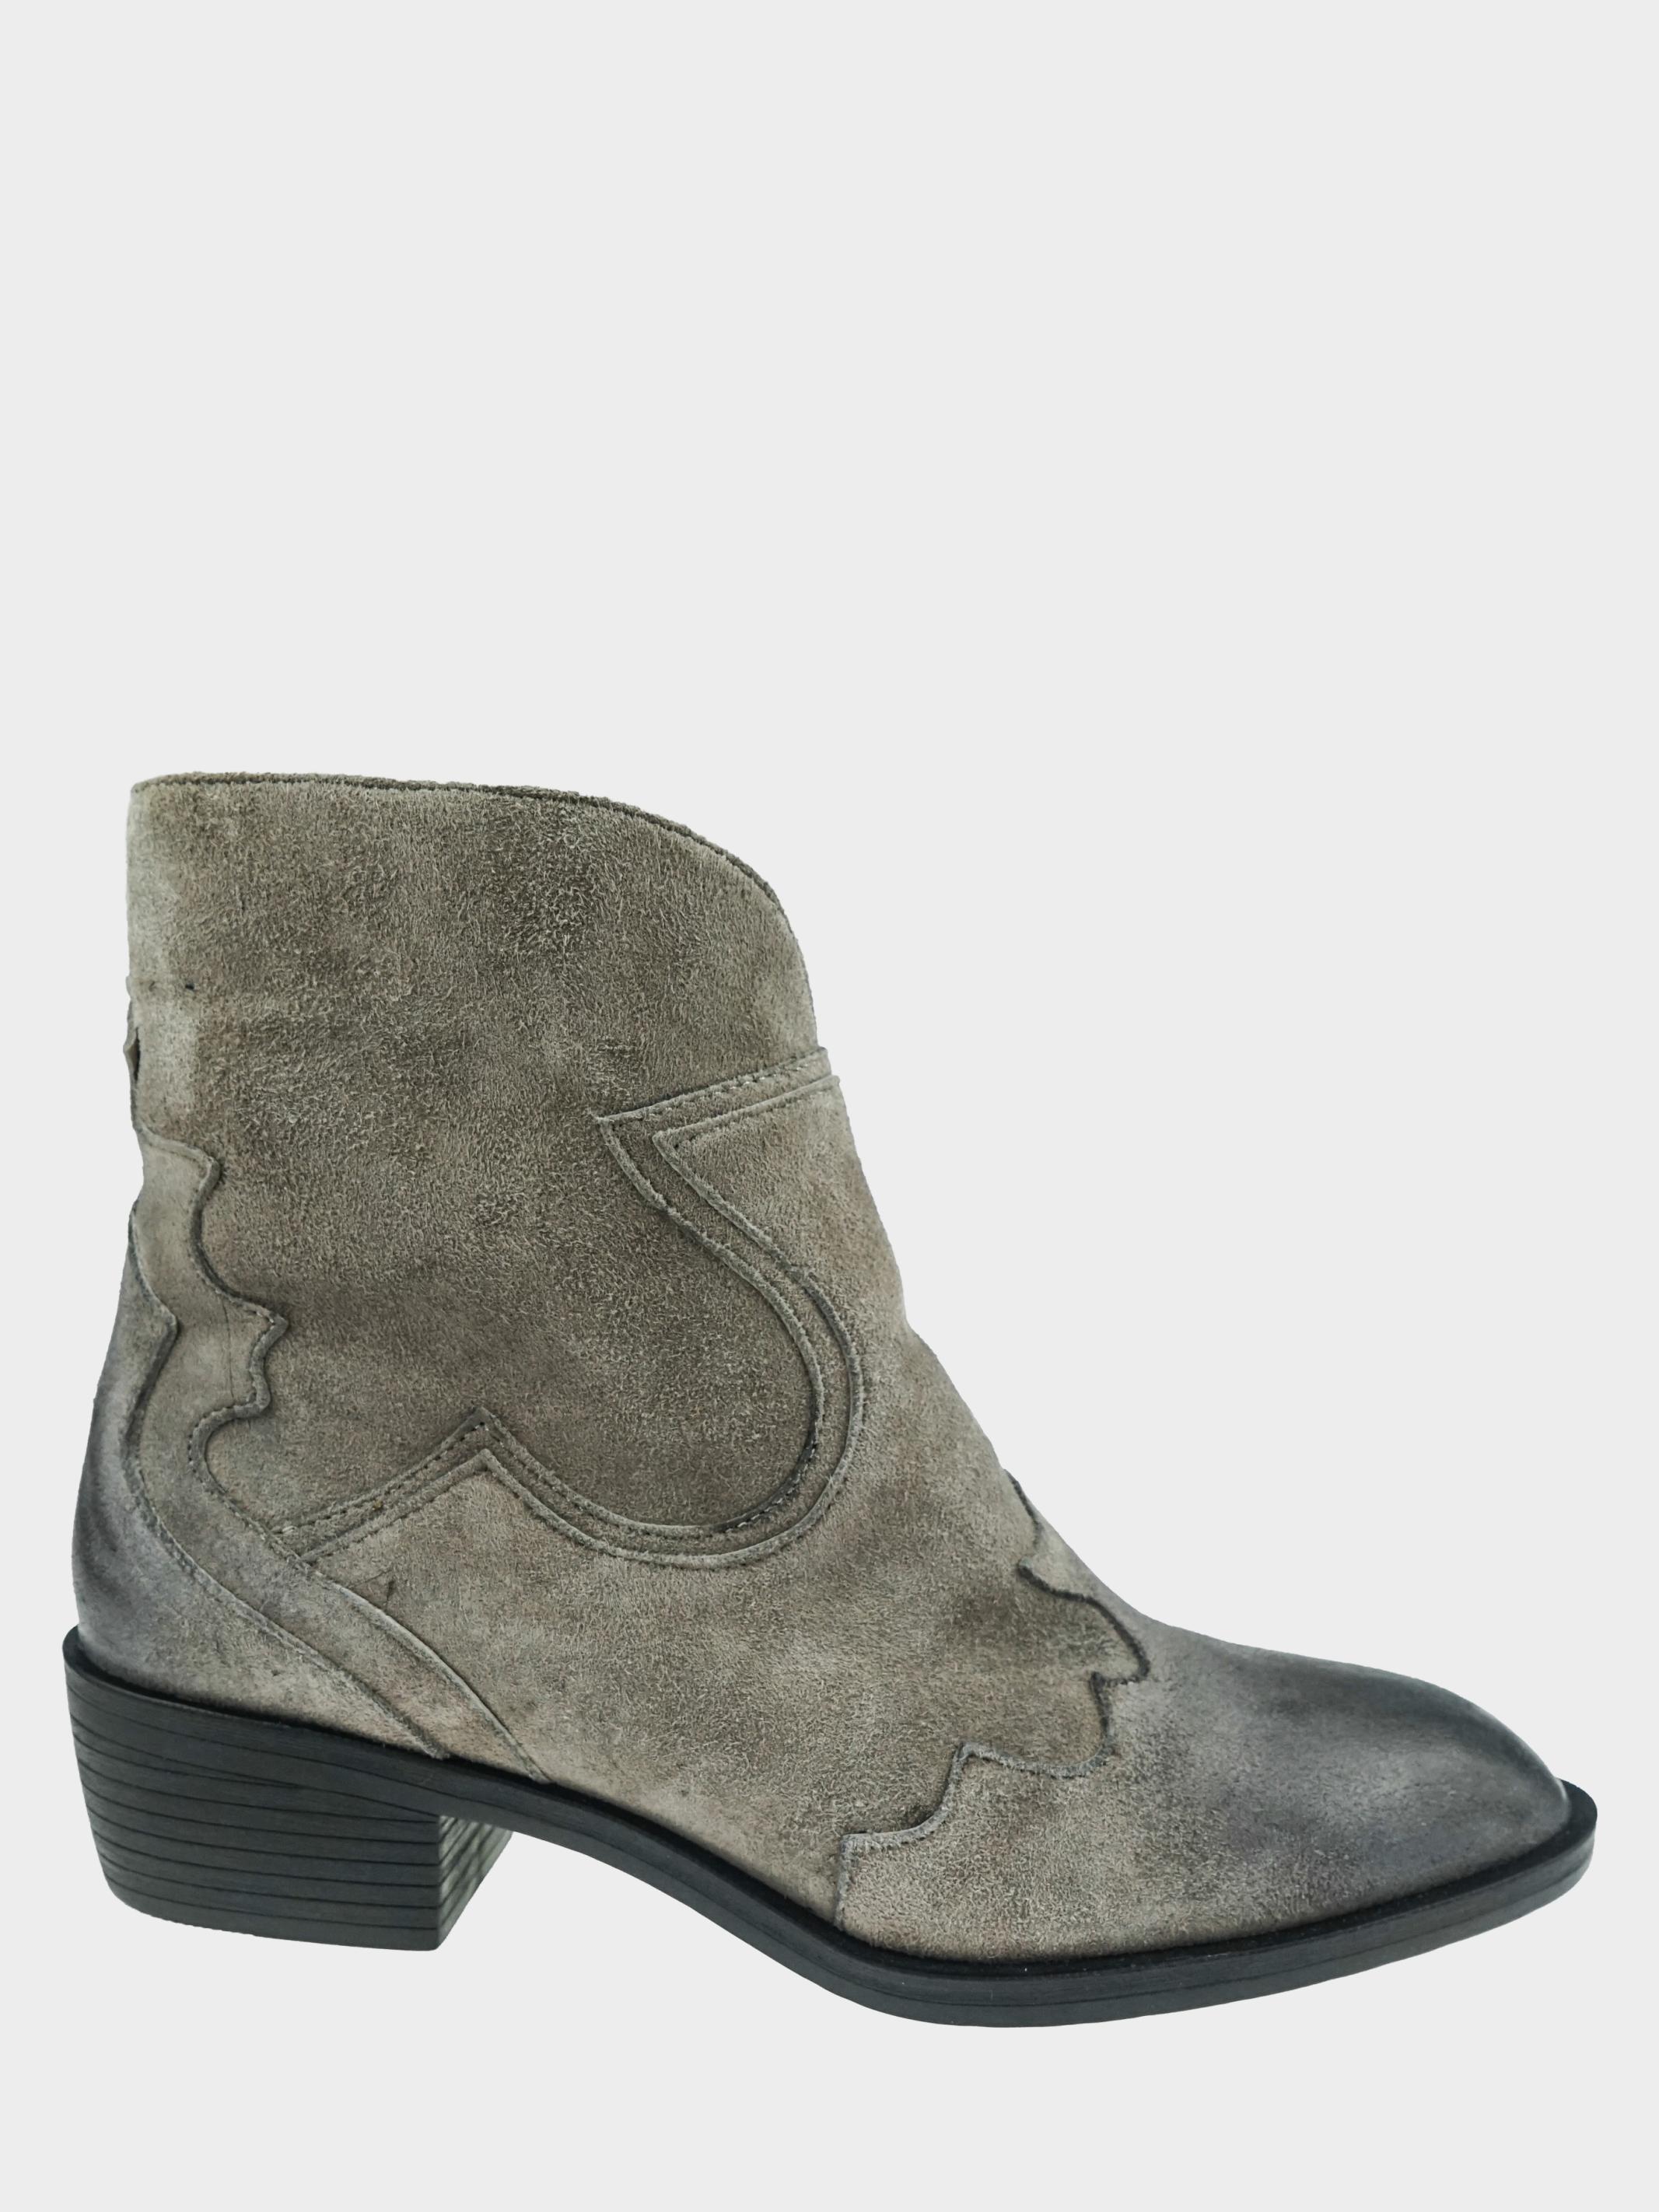 Ботинки женские Казаки Lo1524-95 Lo1524-95 размеры обуви, 2017